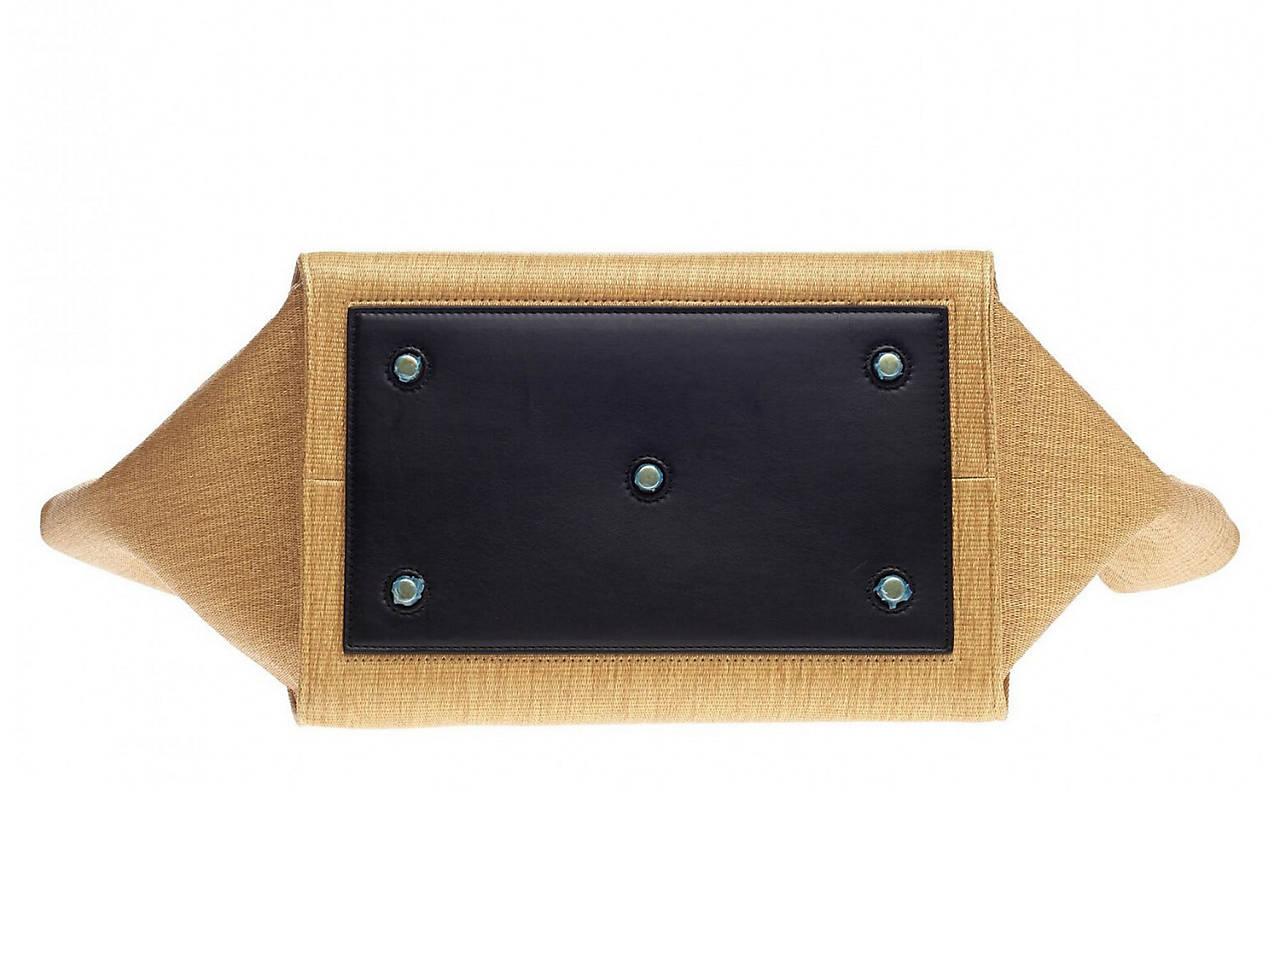 8a04a3586ca Celine - Vintage Luxury Tie Raffia Leather Satchel Women s Handbags ...